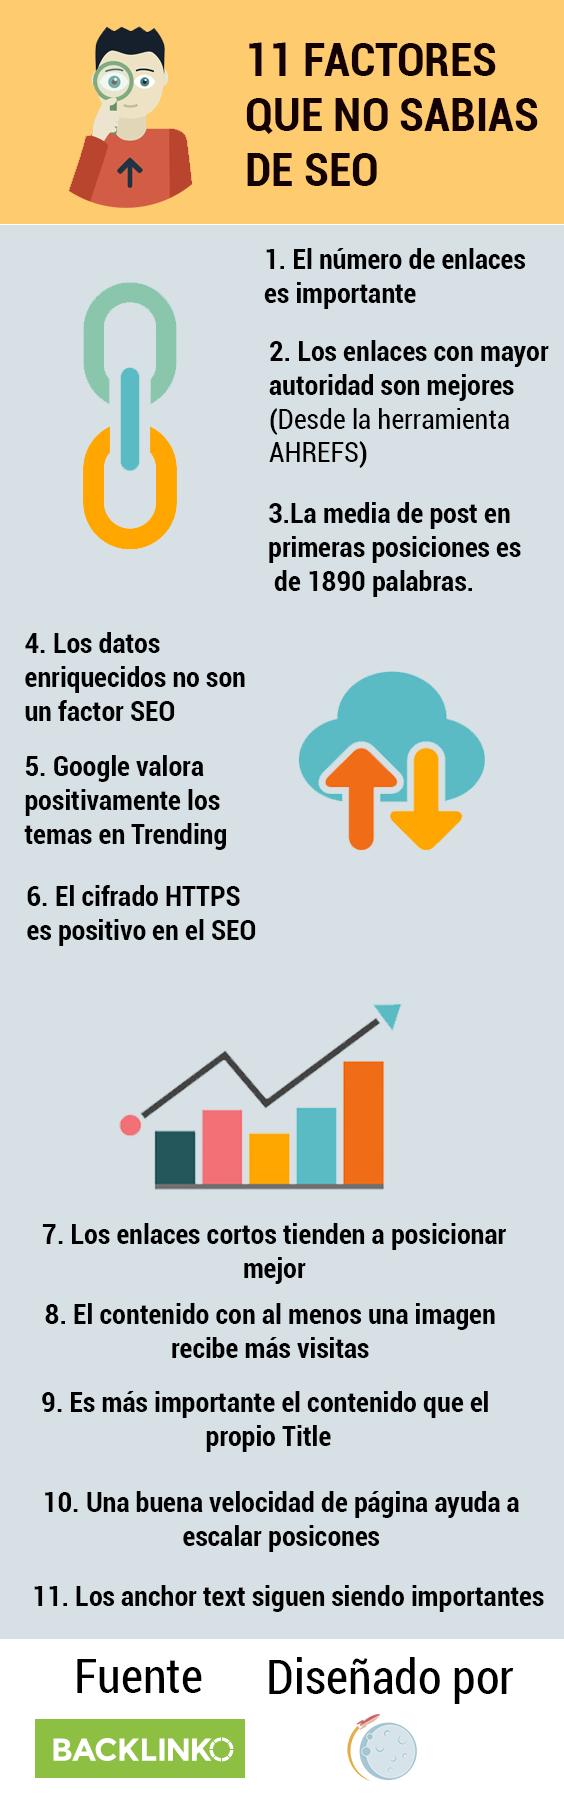 infografia-factores-seo